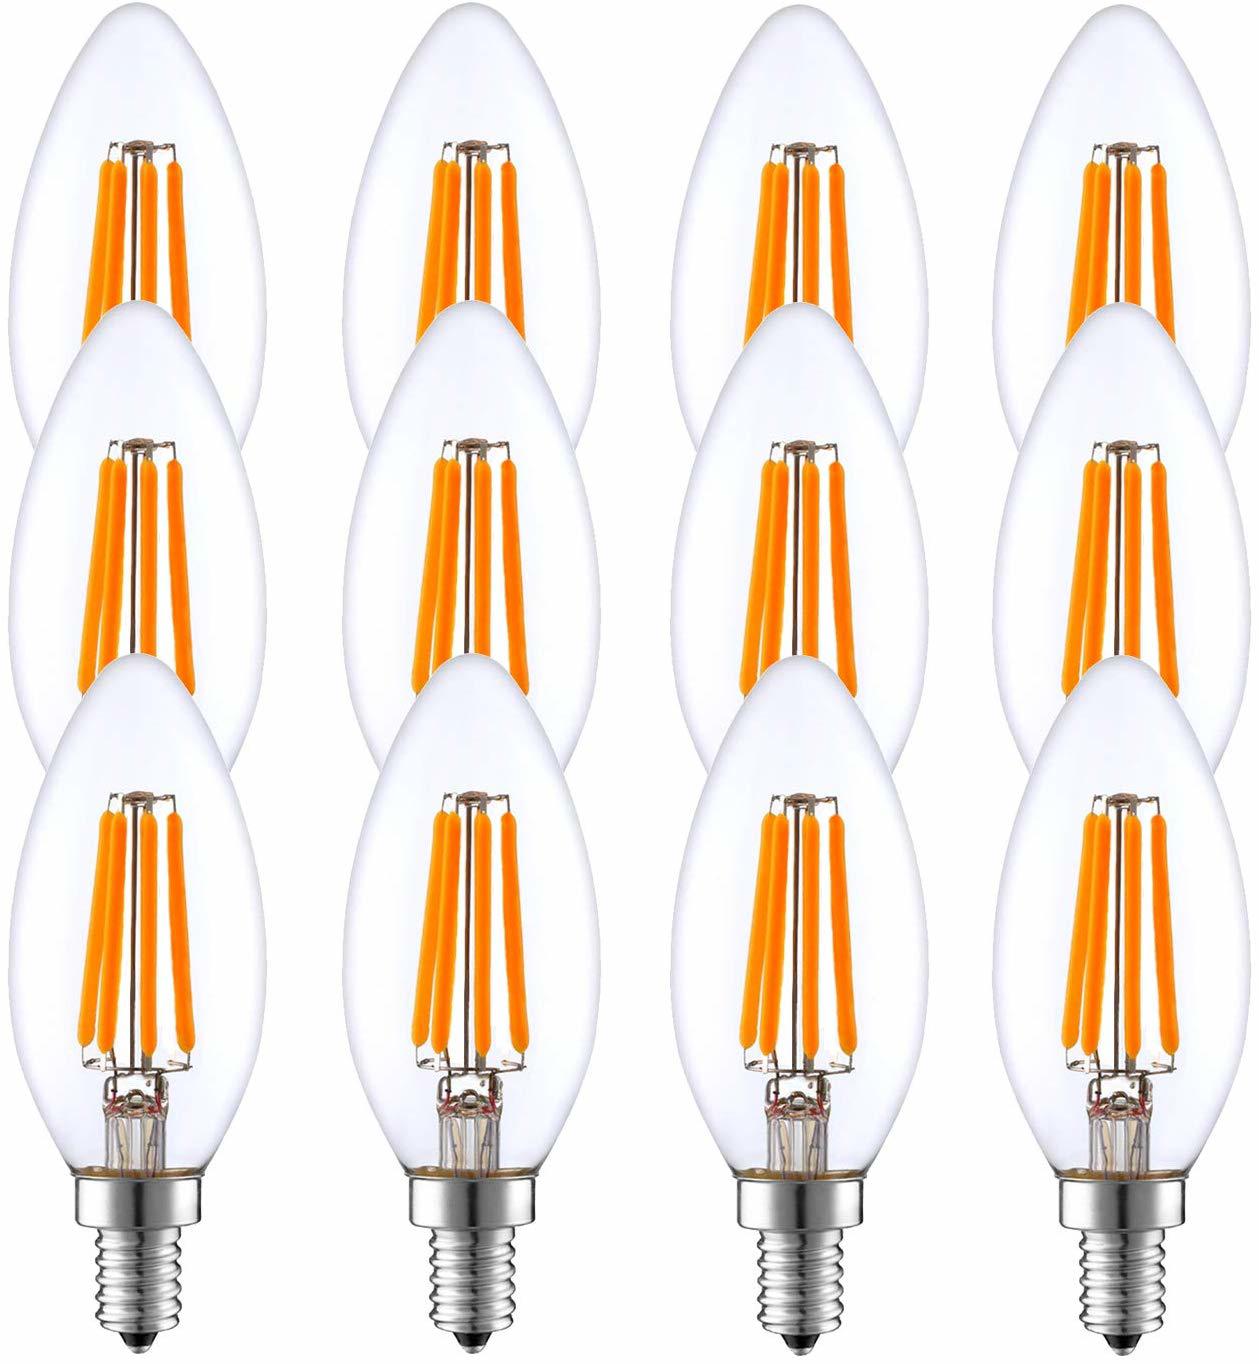 12 Pack E14 Led Candle Light Bulbs 40w Equivalent Room